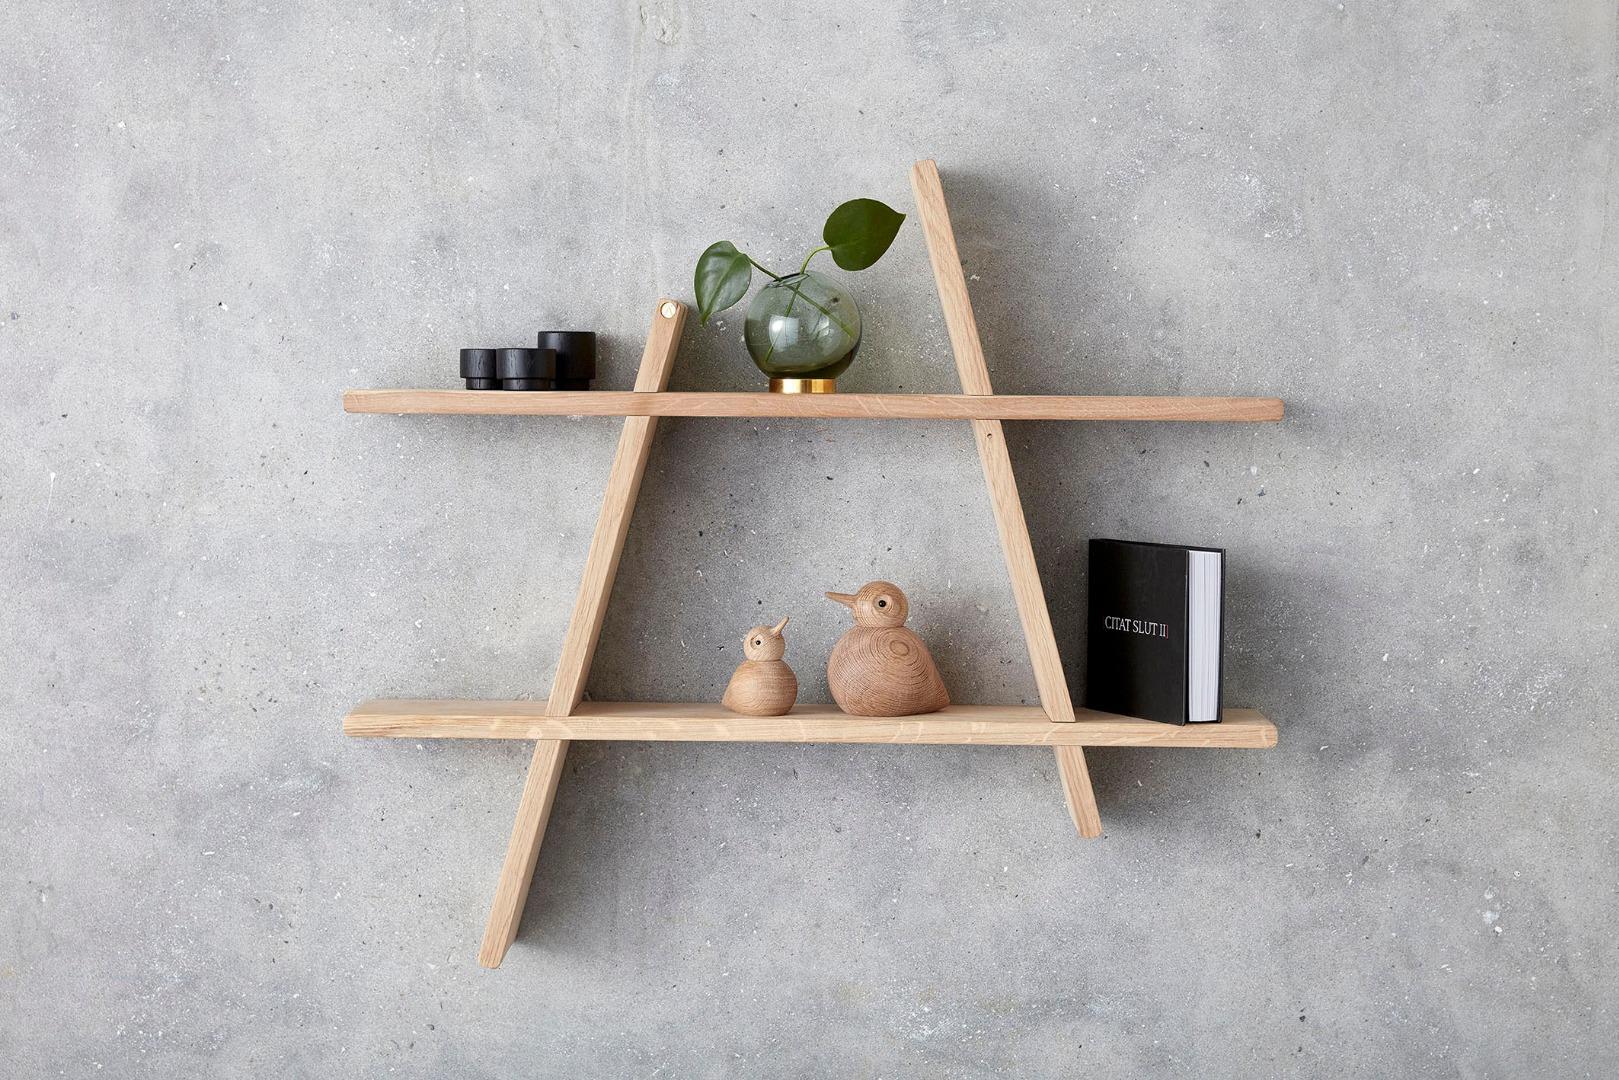 andersen-a-shelf-1